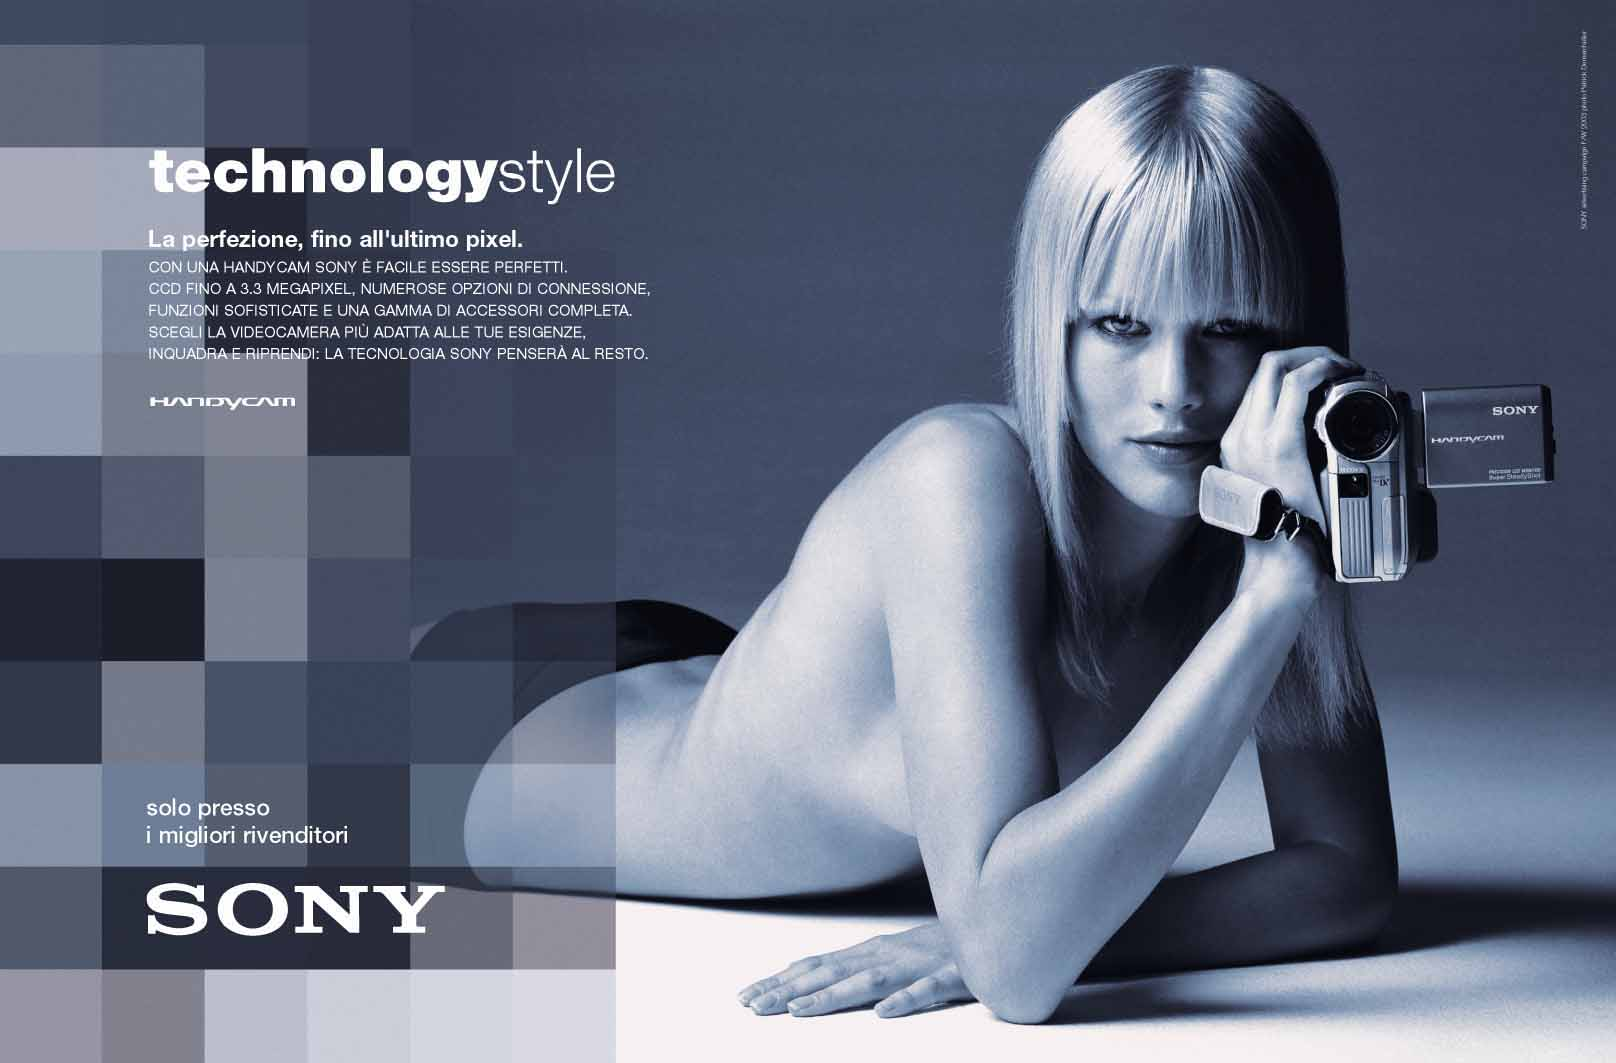 02_Sony1.jpg